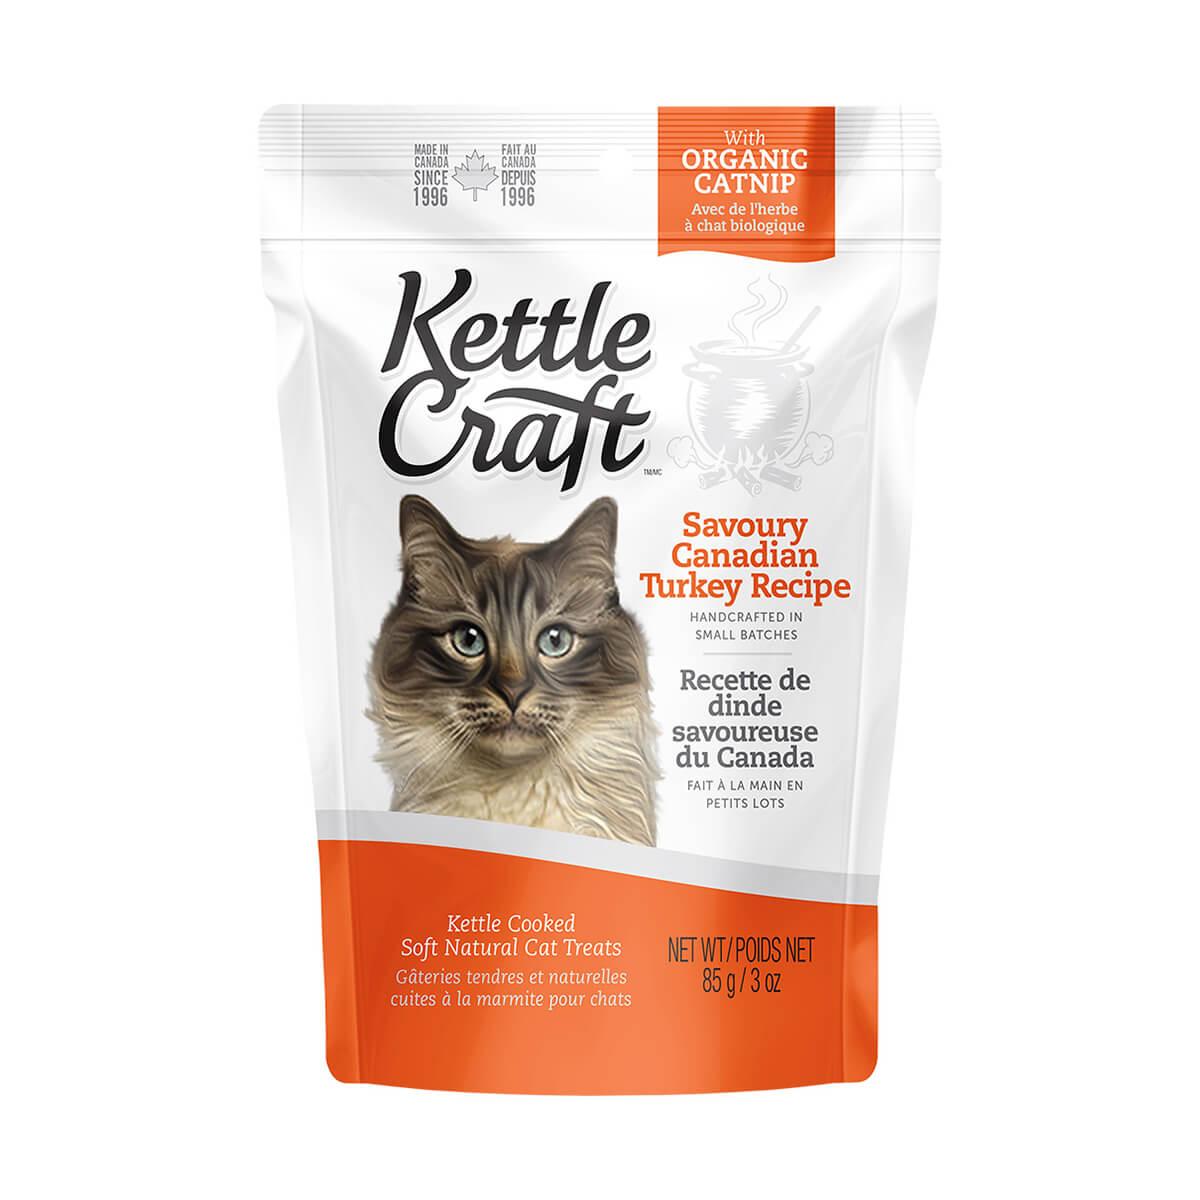 Kettle Craft Turkey Recipe Cat Treats - 85 g